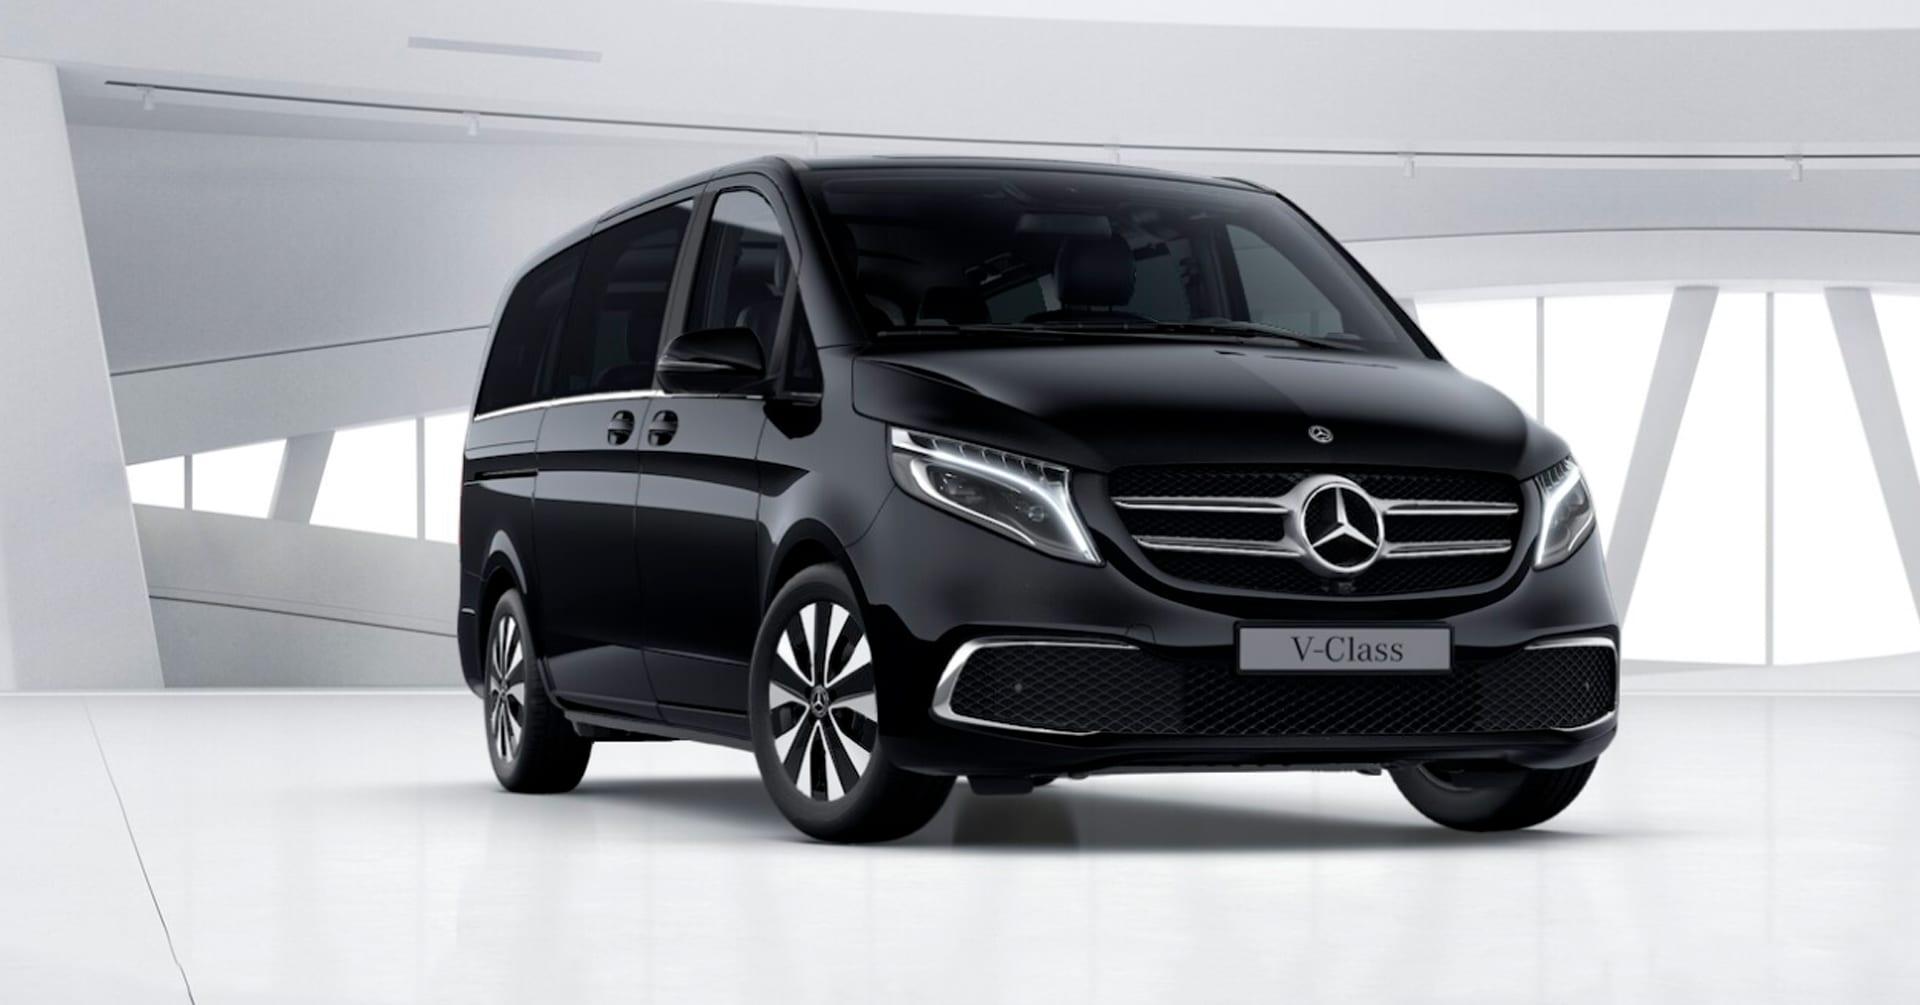 Mercedes-Benz V-Class 5152600159